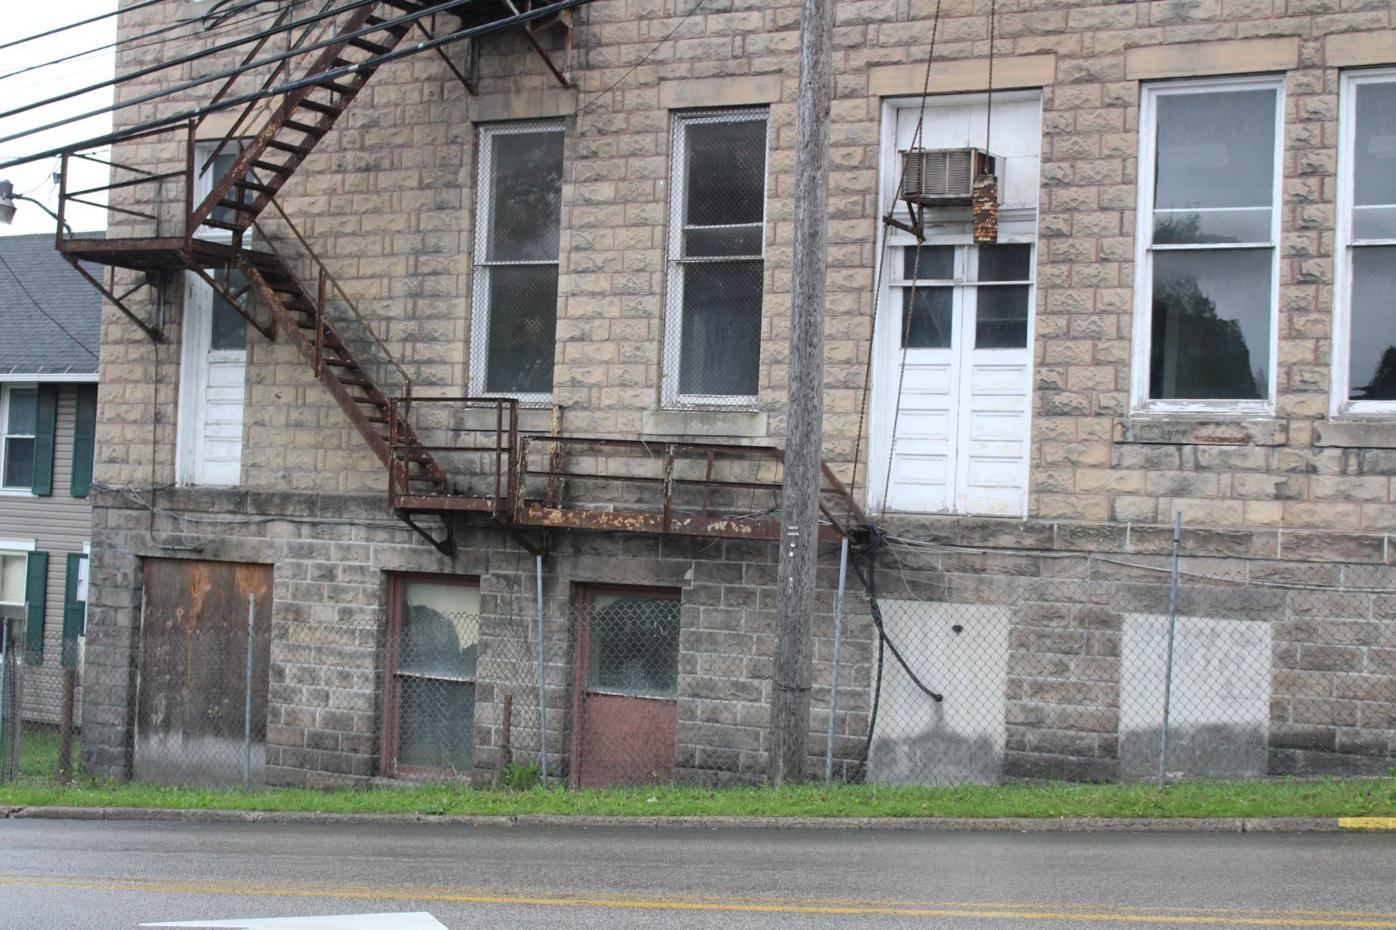 Herring Building fire escape